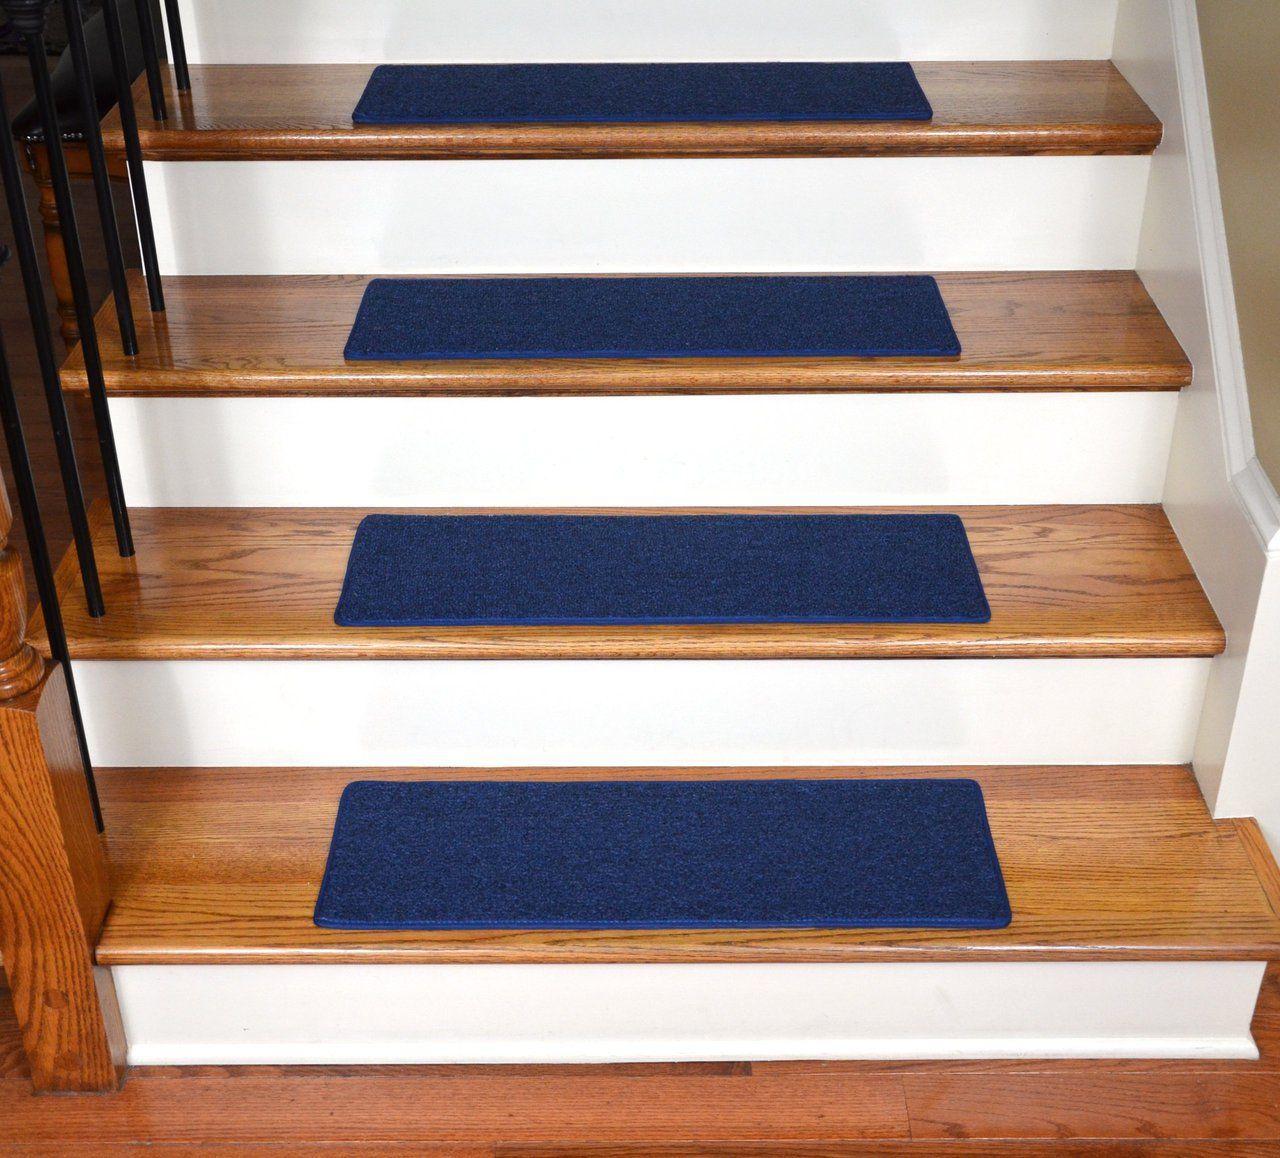 Best Dean Non Slip Tape Free Pet Friendly Diy Carpet Stair 400 x 300